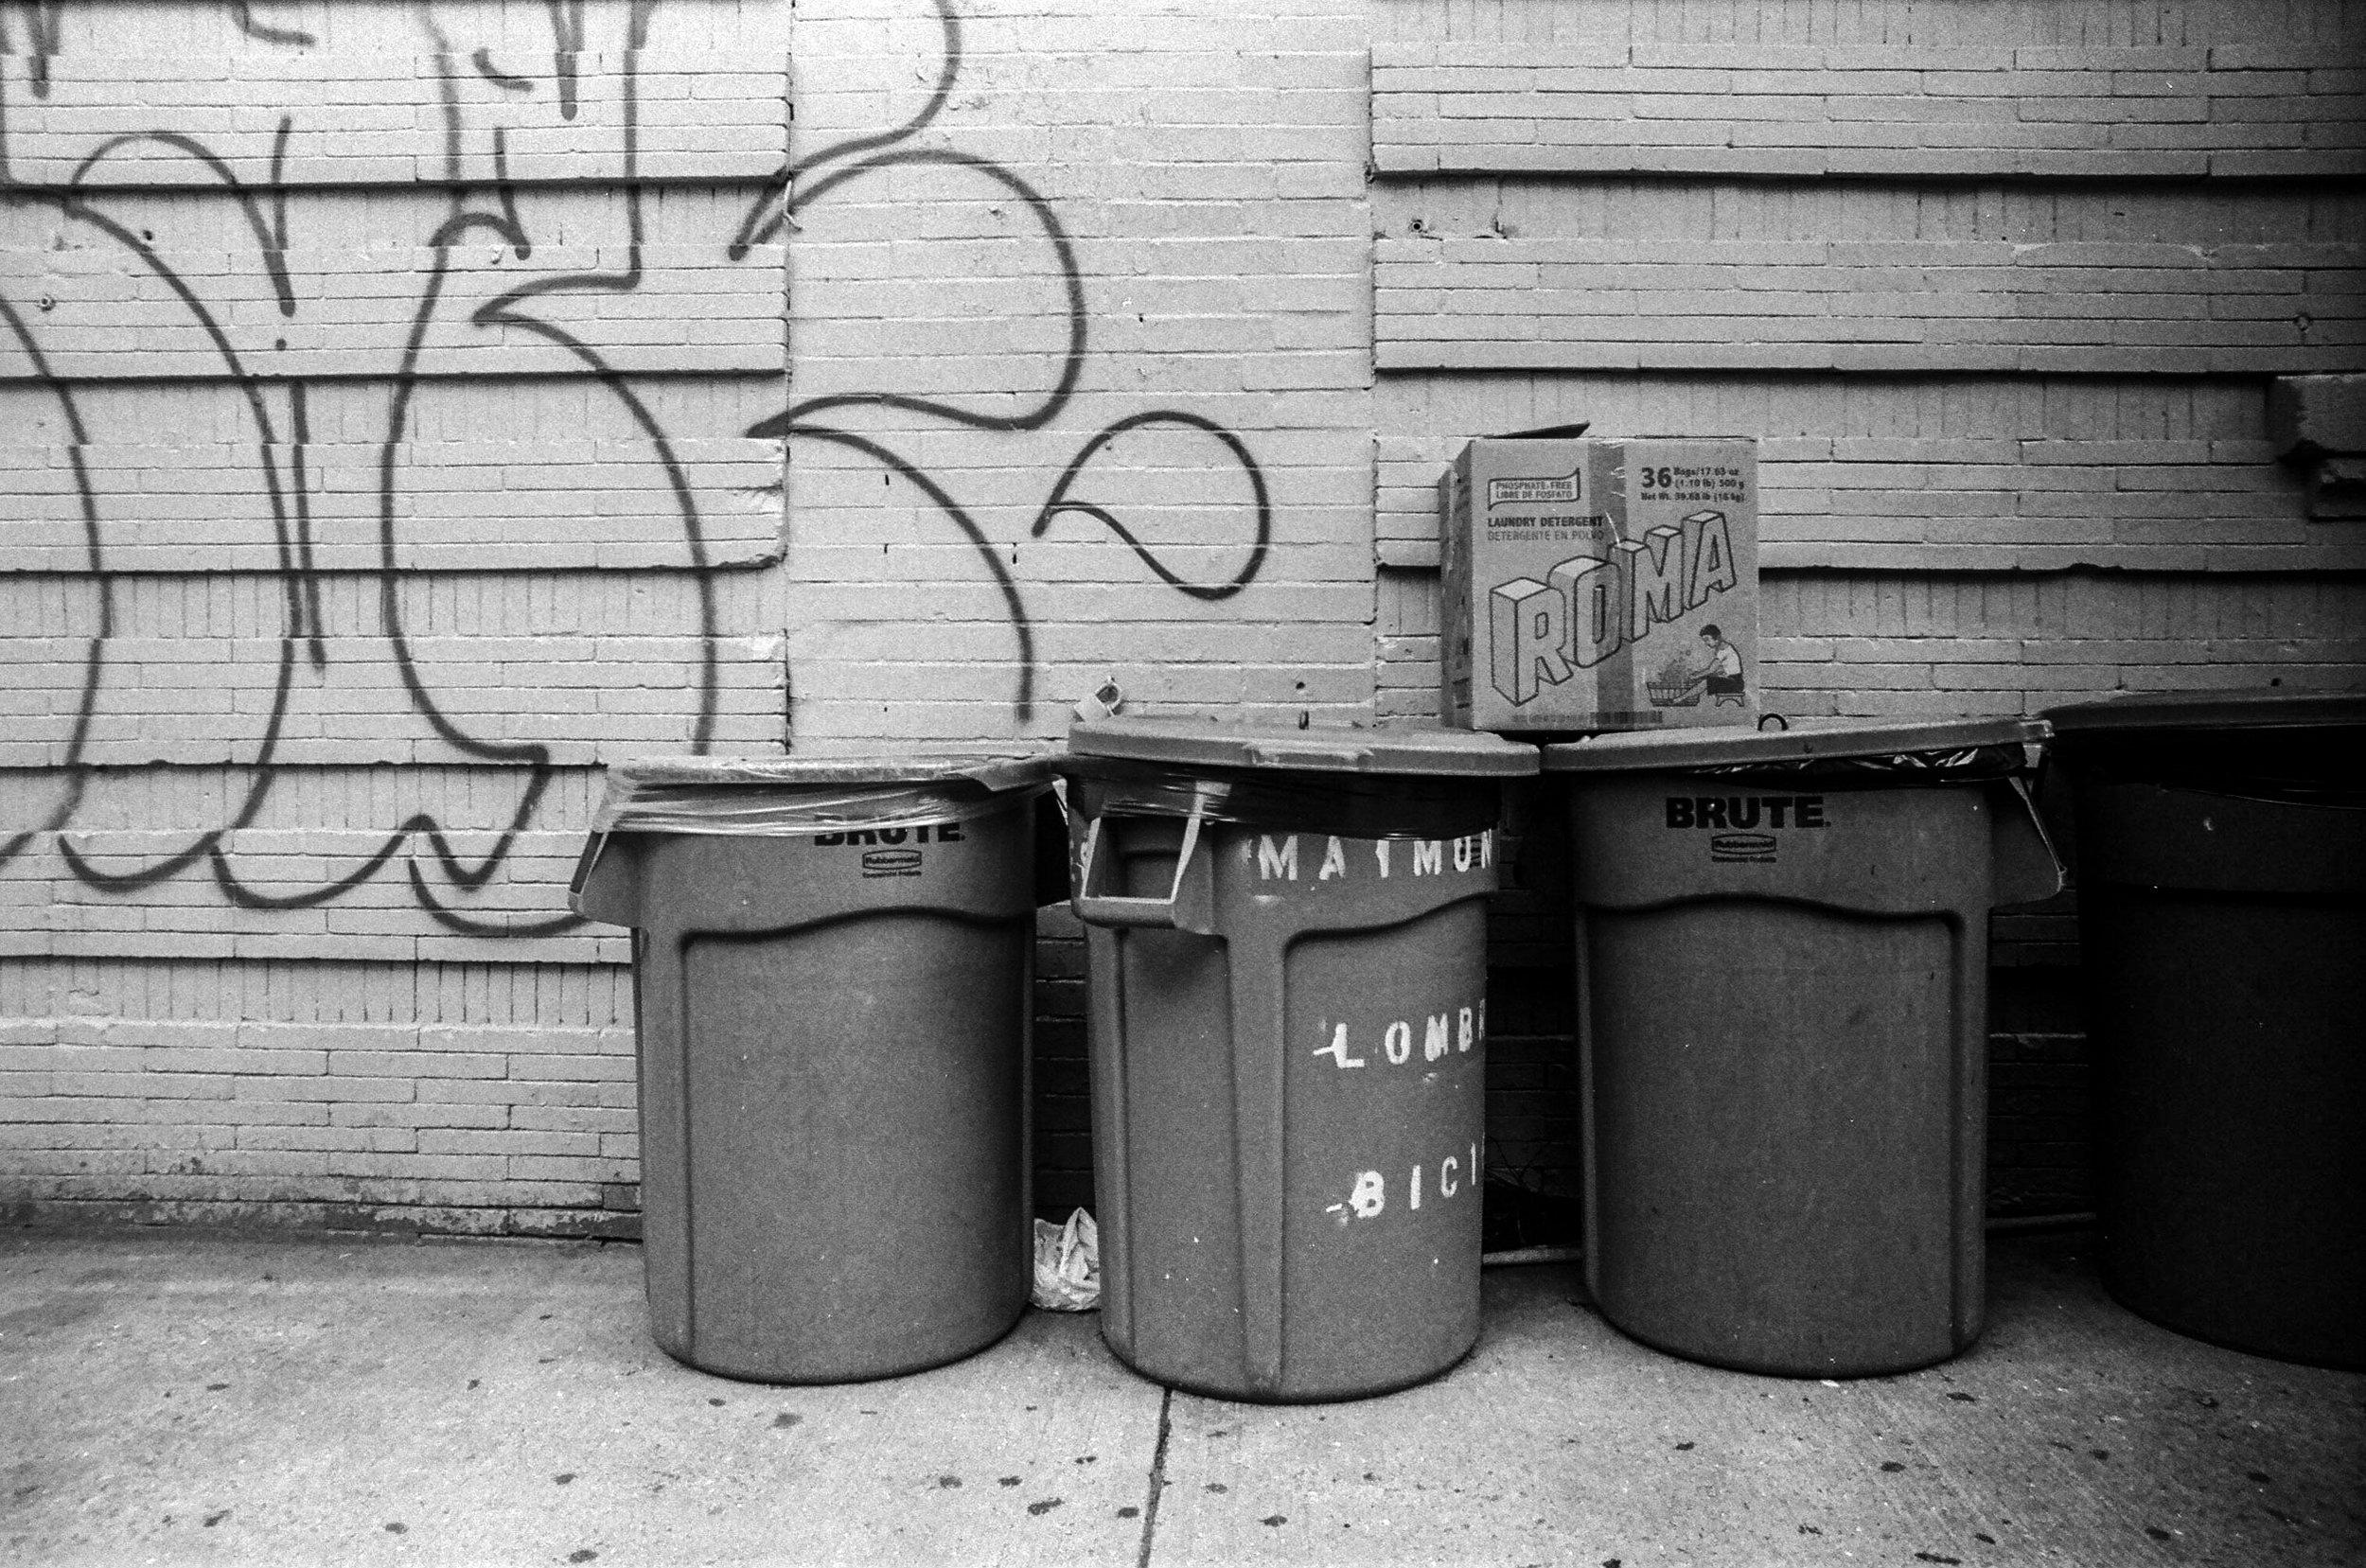 Roma, Flatbush, Brooklyn_Film Photography_NYC_Joe Curry Photography_2018.jpg